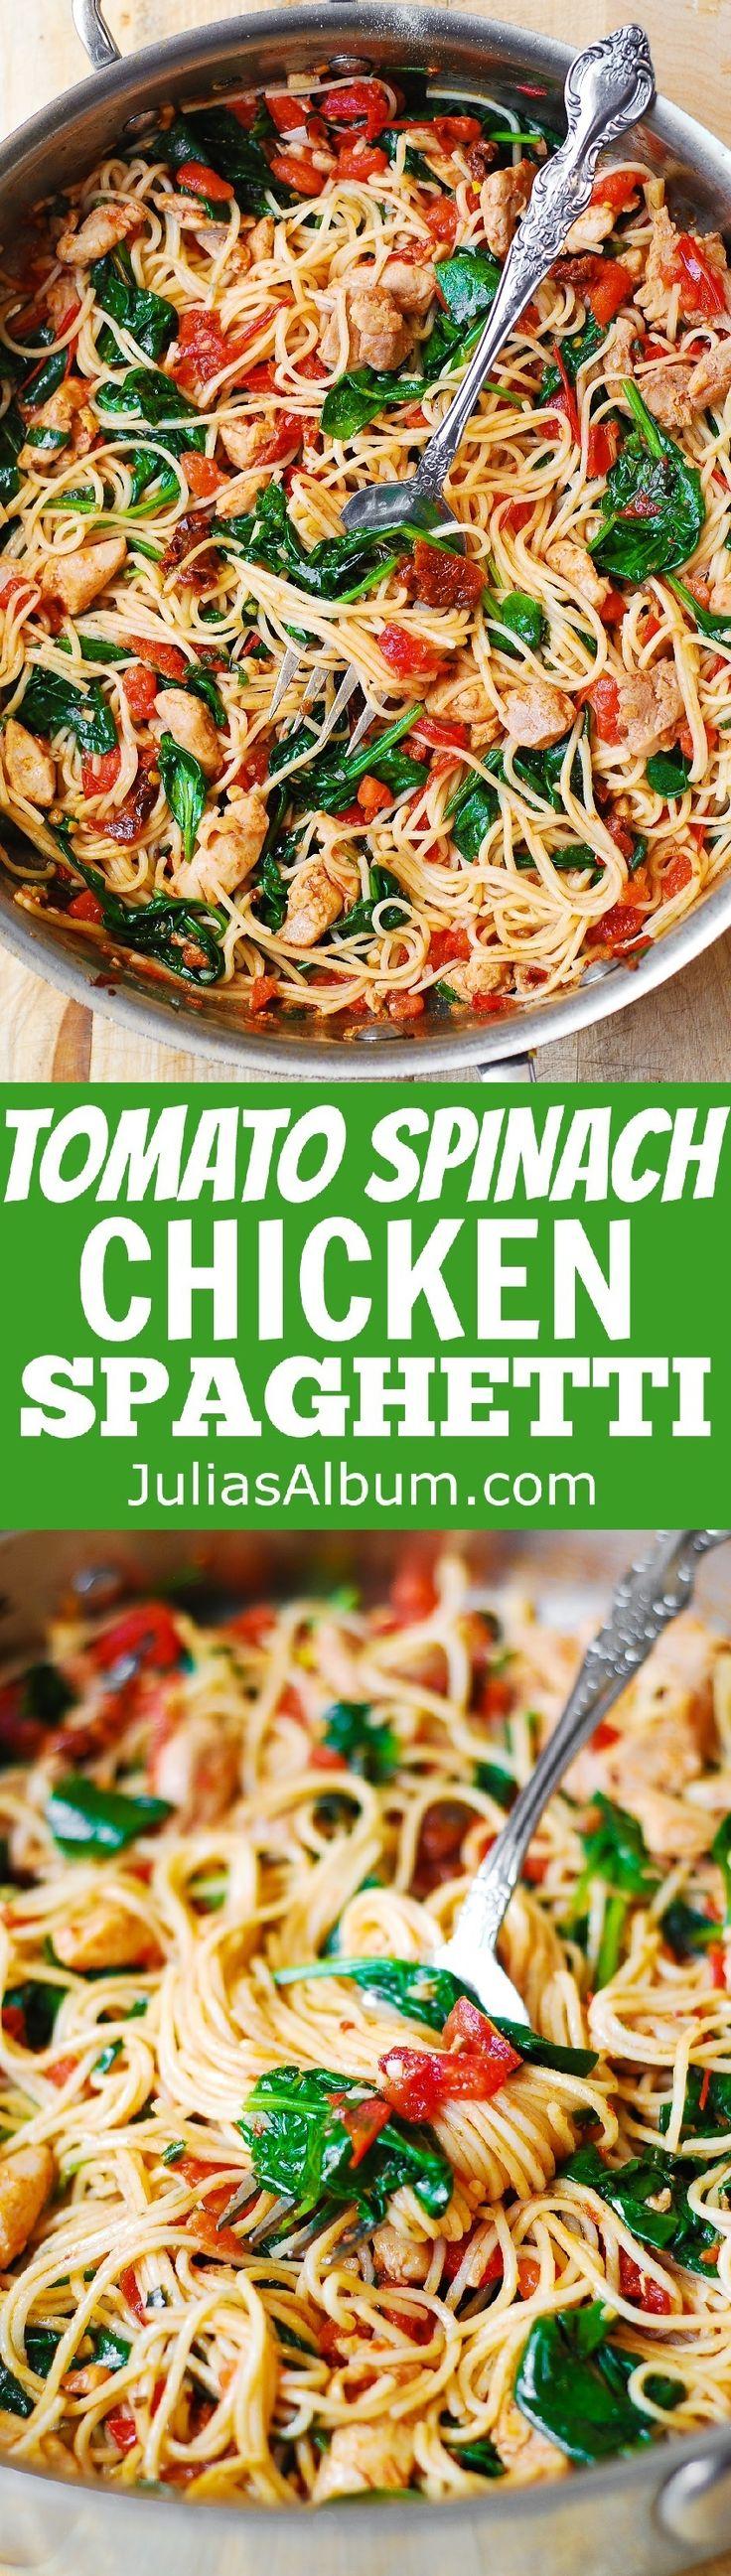 how to make spaghetti jollibee style